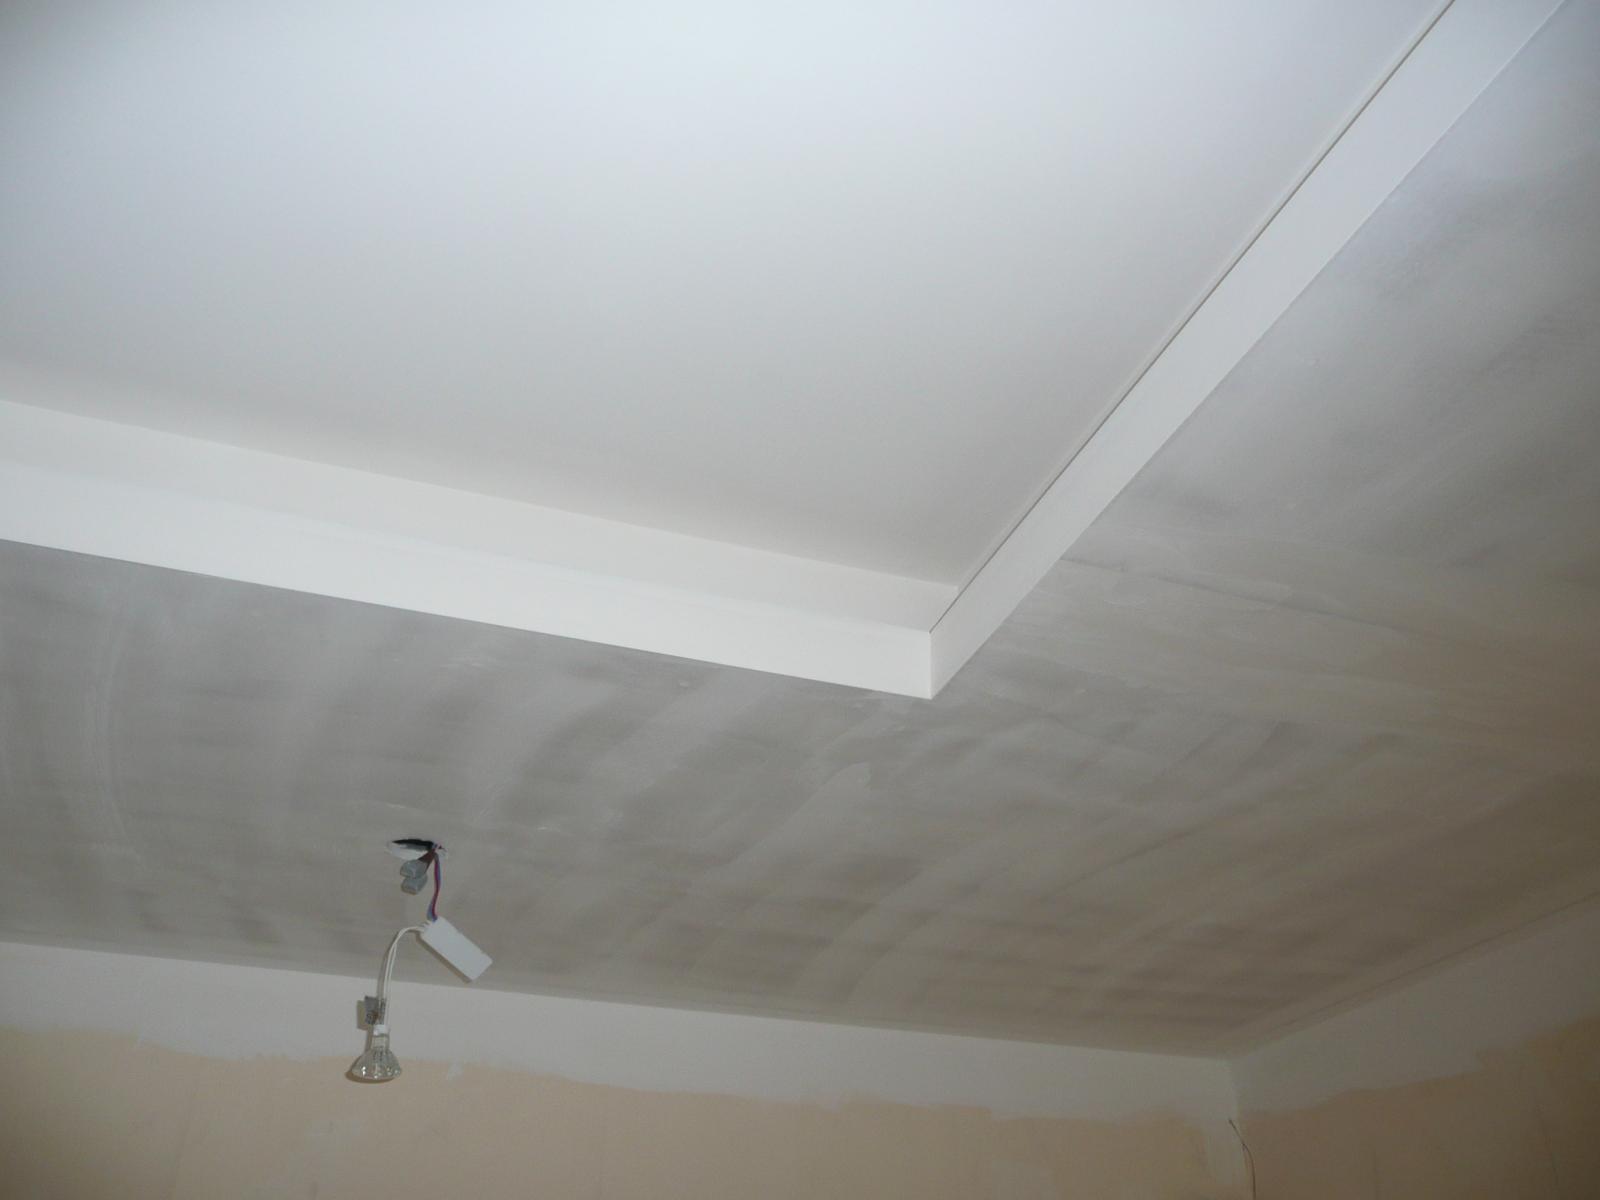 fixation dans plafond place. Black Bedroom Furniture Sets. Home Design Ideas